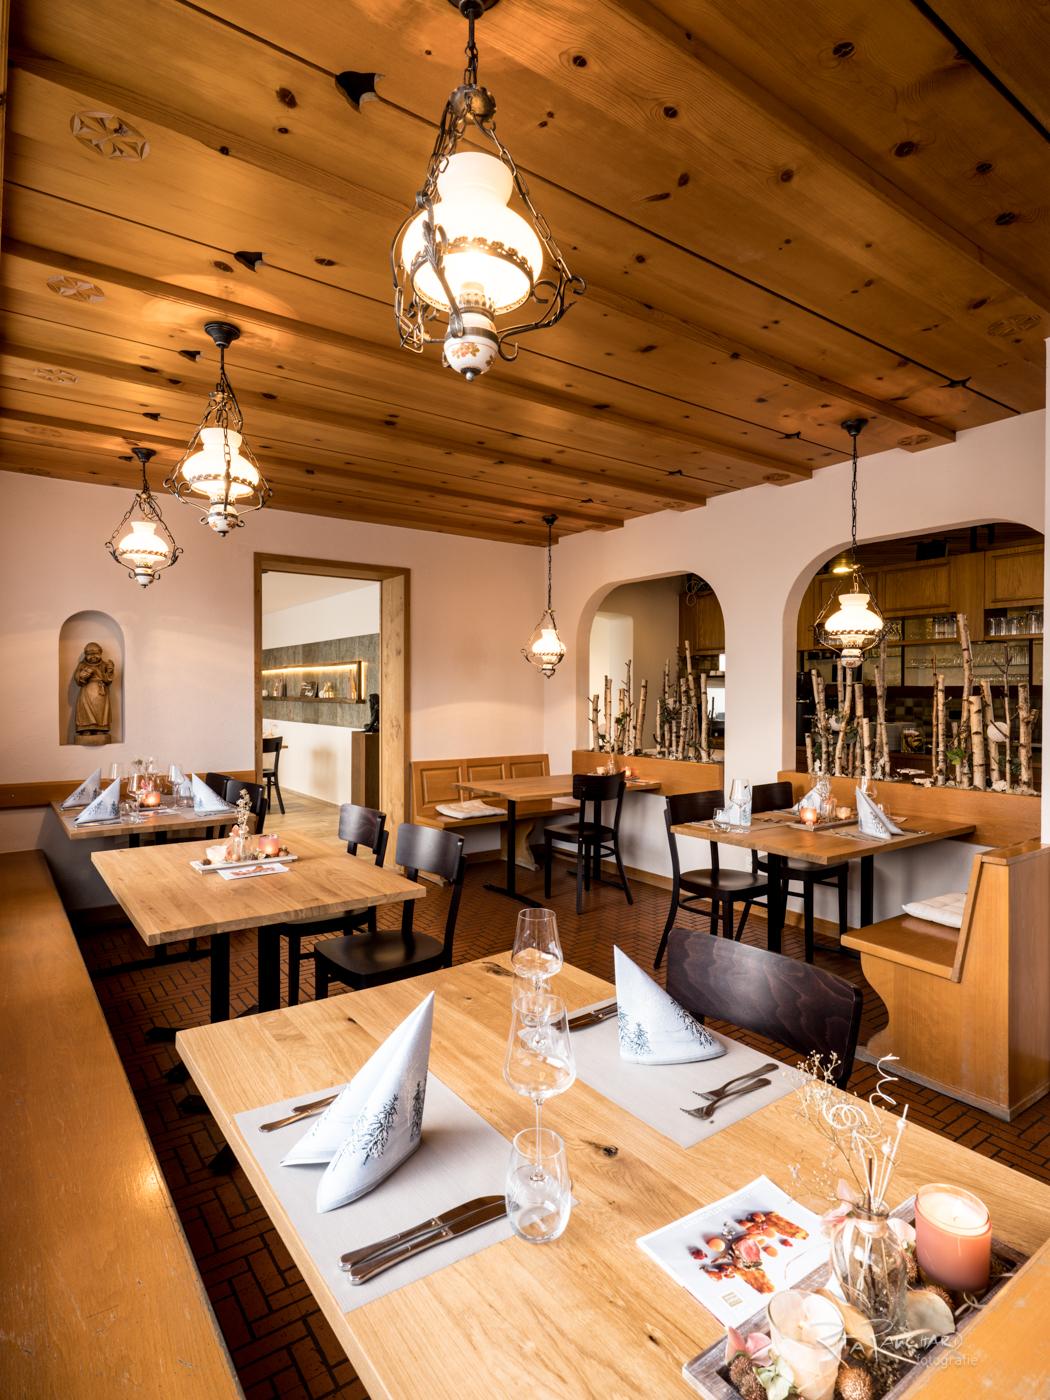 restaurantfotografie_gastrofotografie-5080.jpg